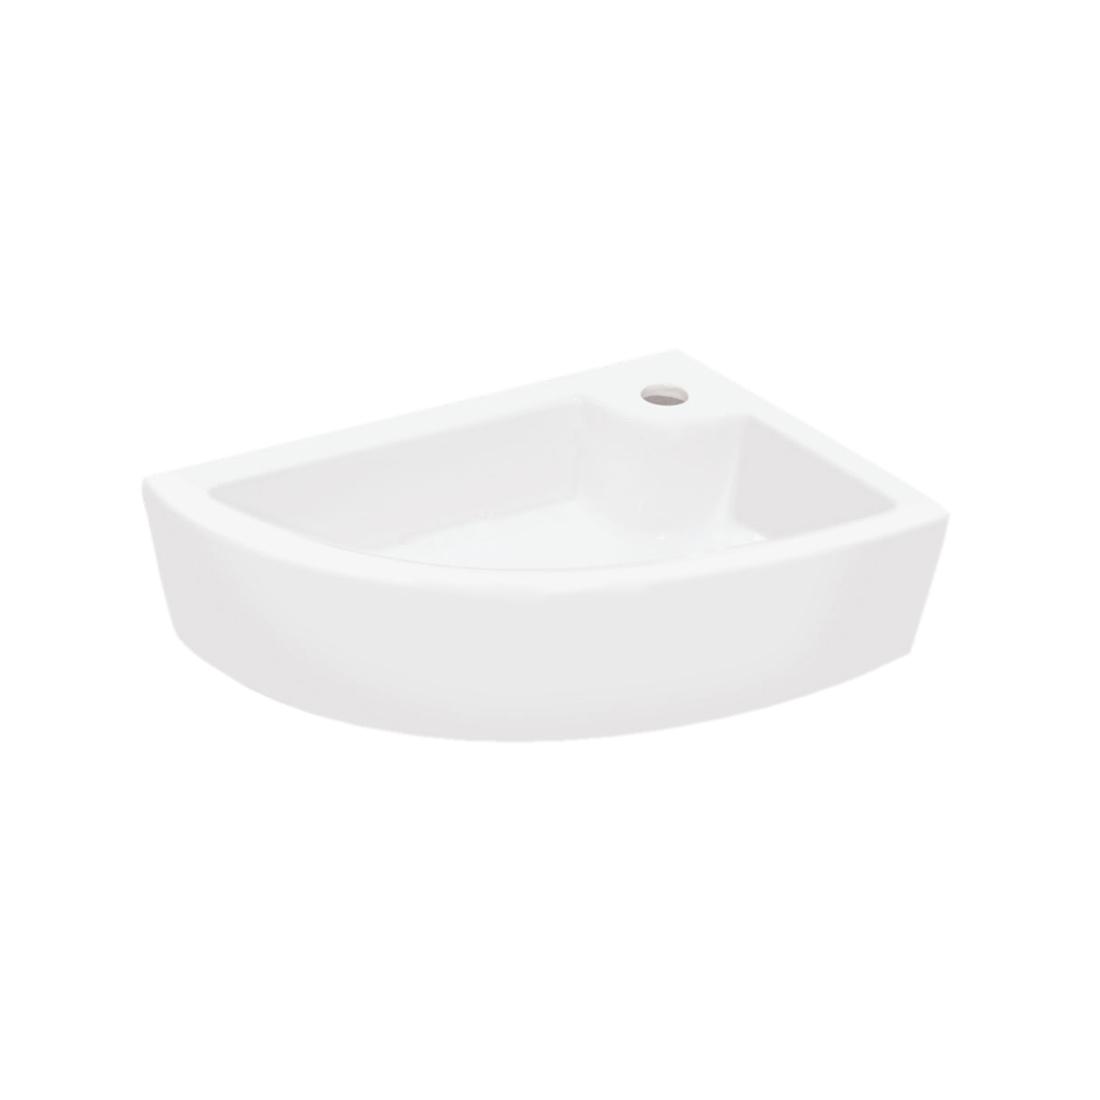 Kerovit Gem KS209 Counter Top Wash Basin